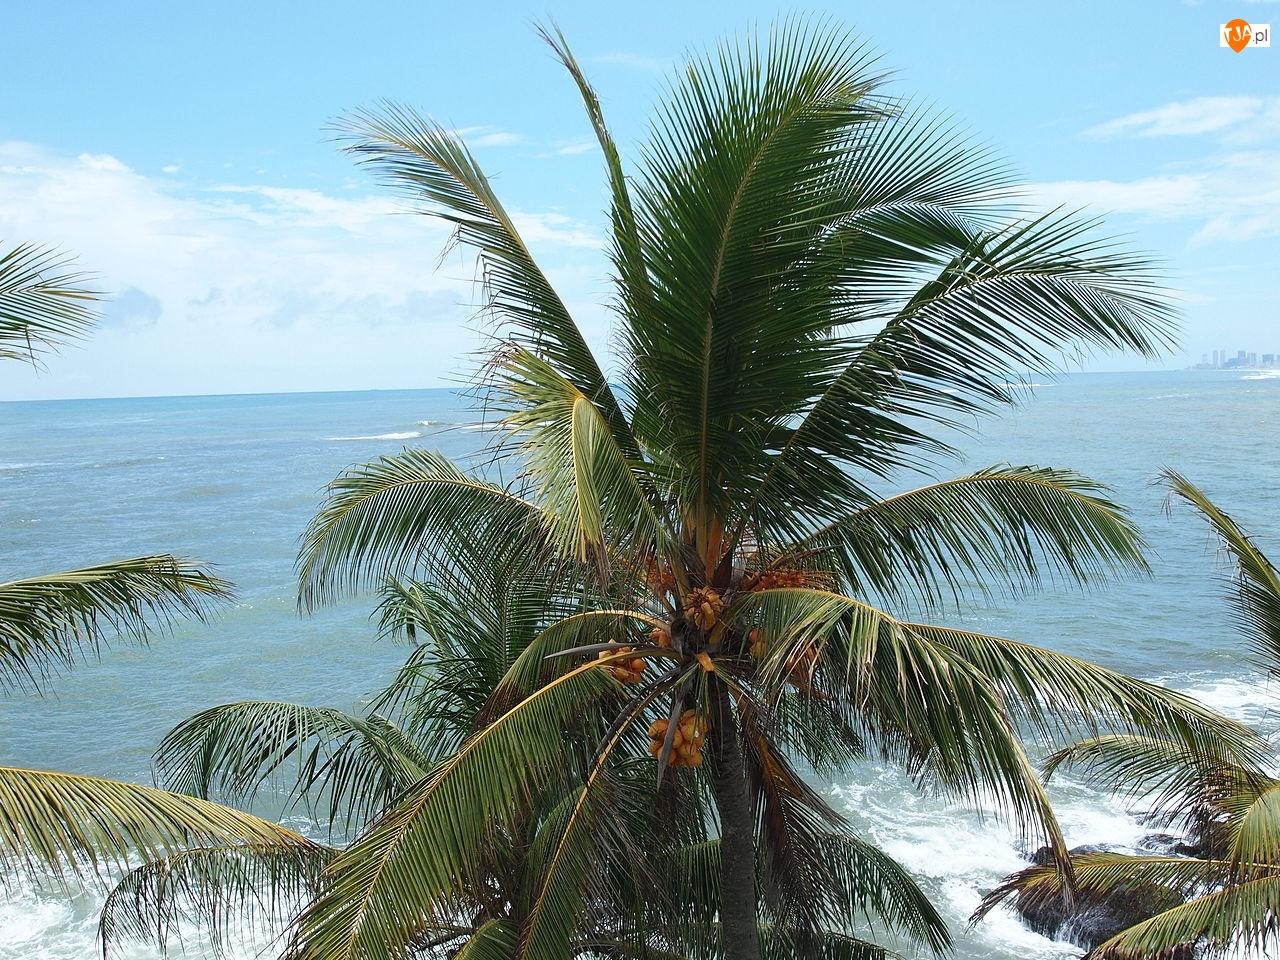 Morze, Palma, Kokosowa